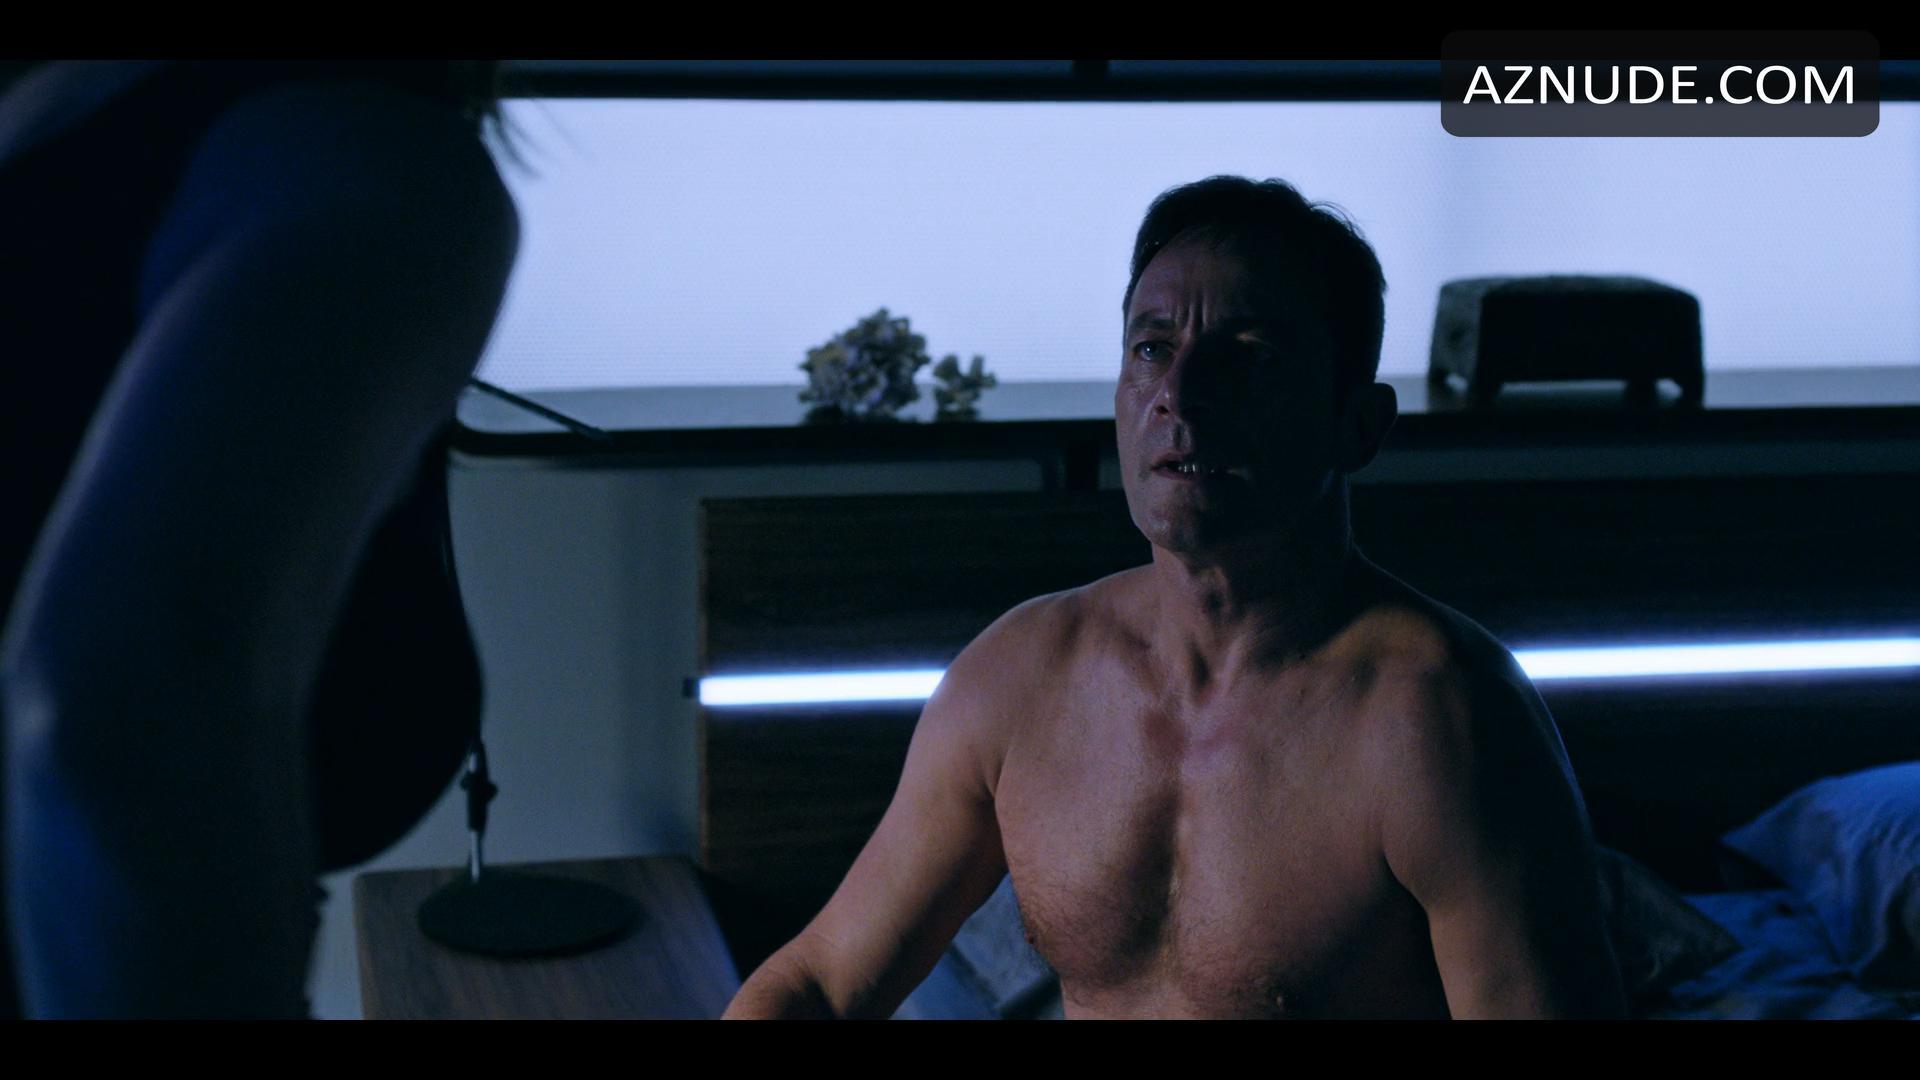 from Justus star trek sex scene video